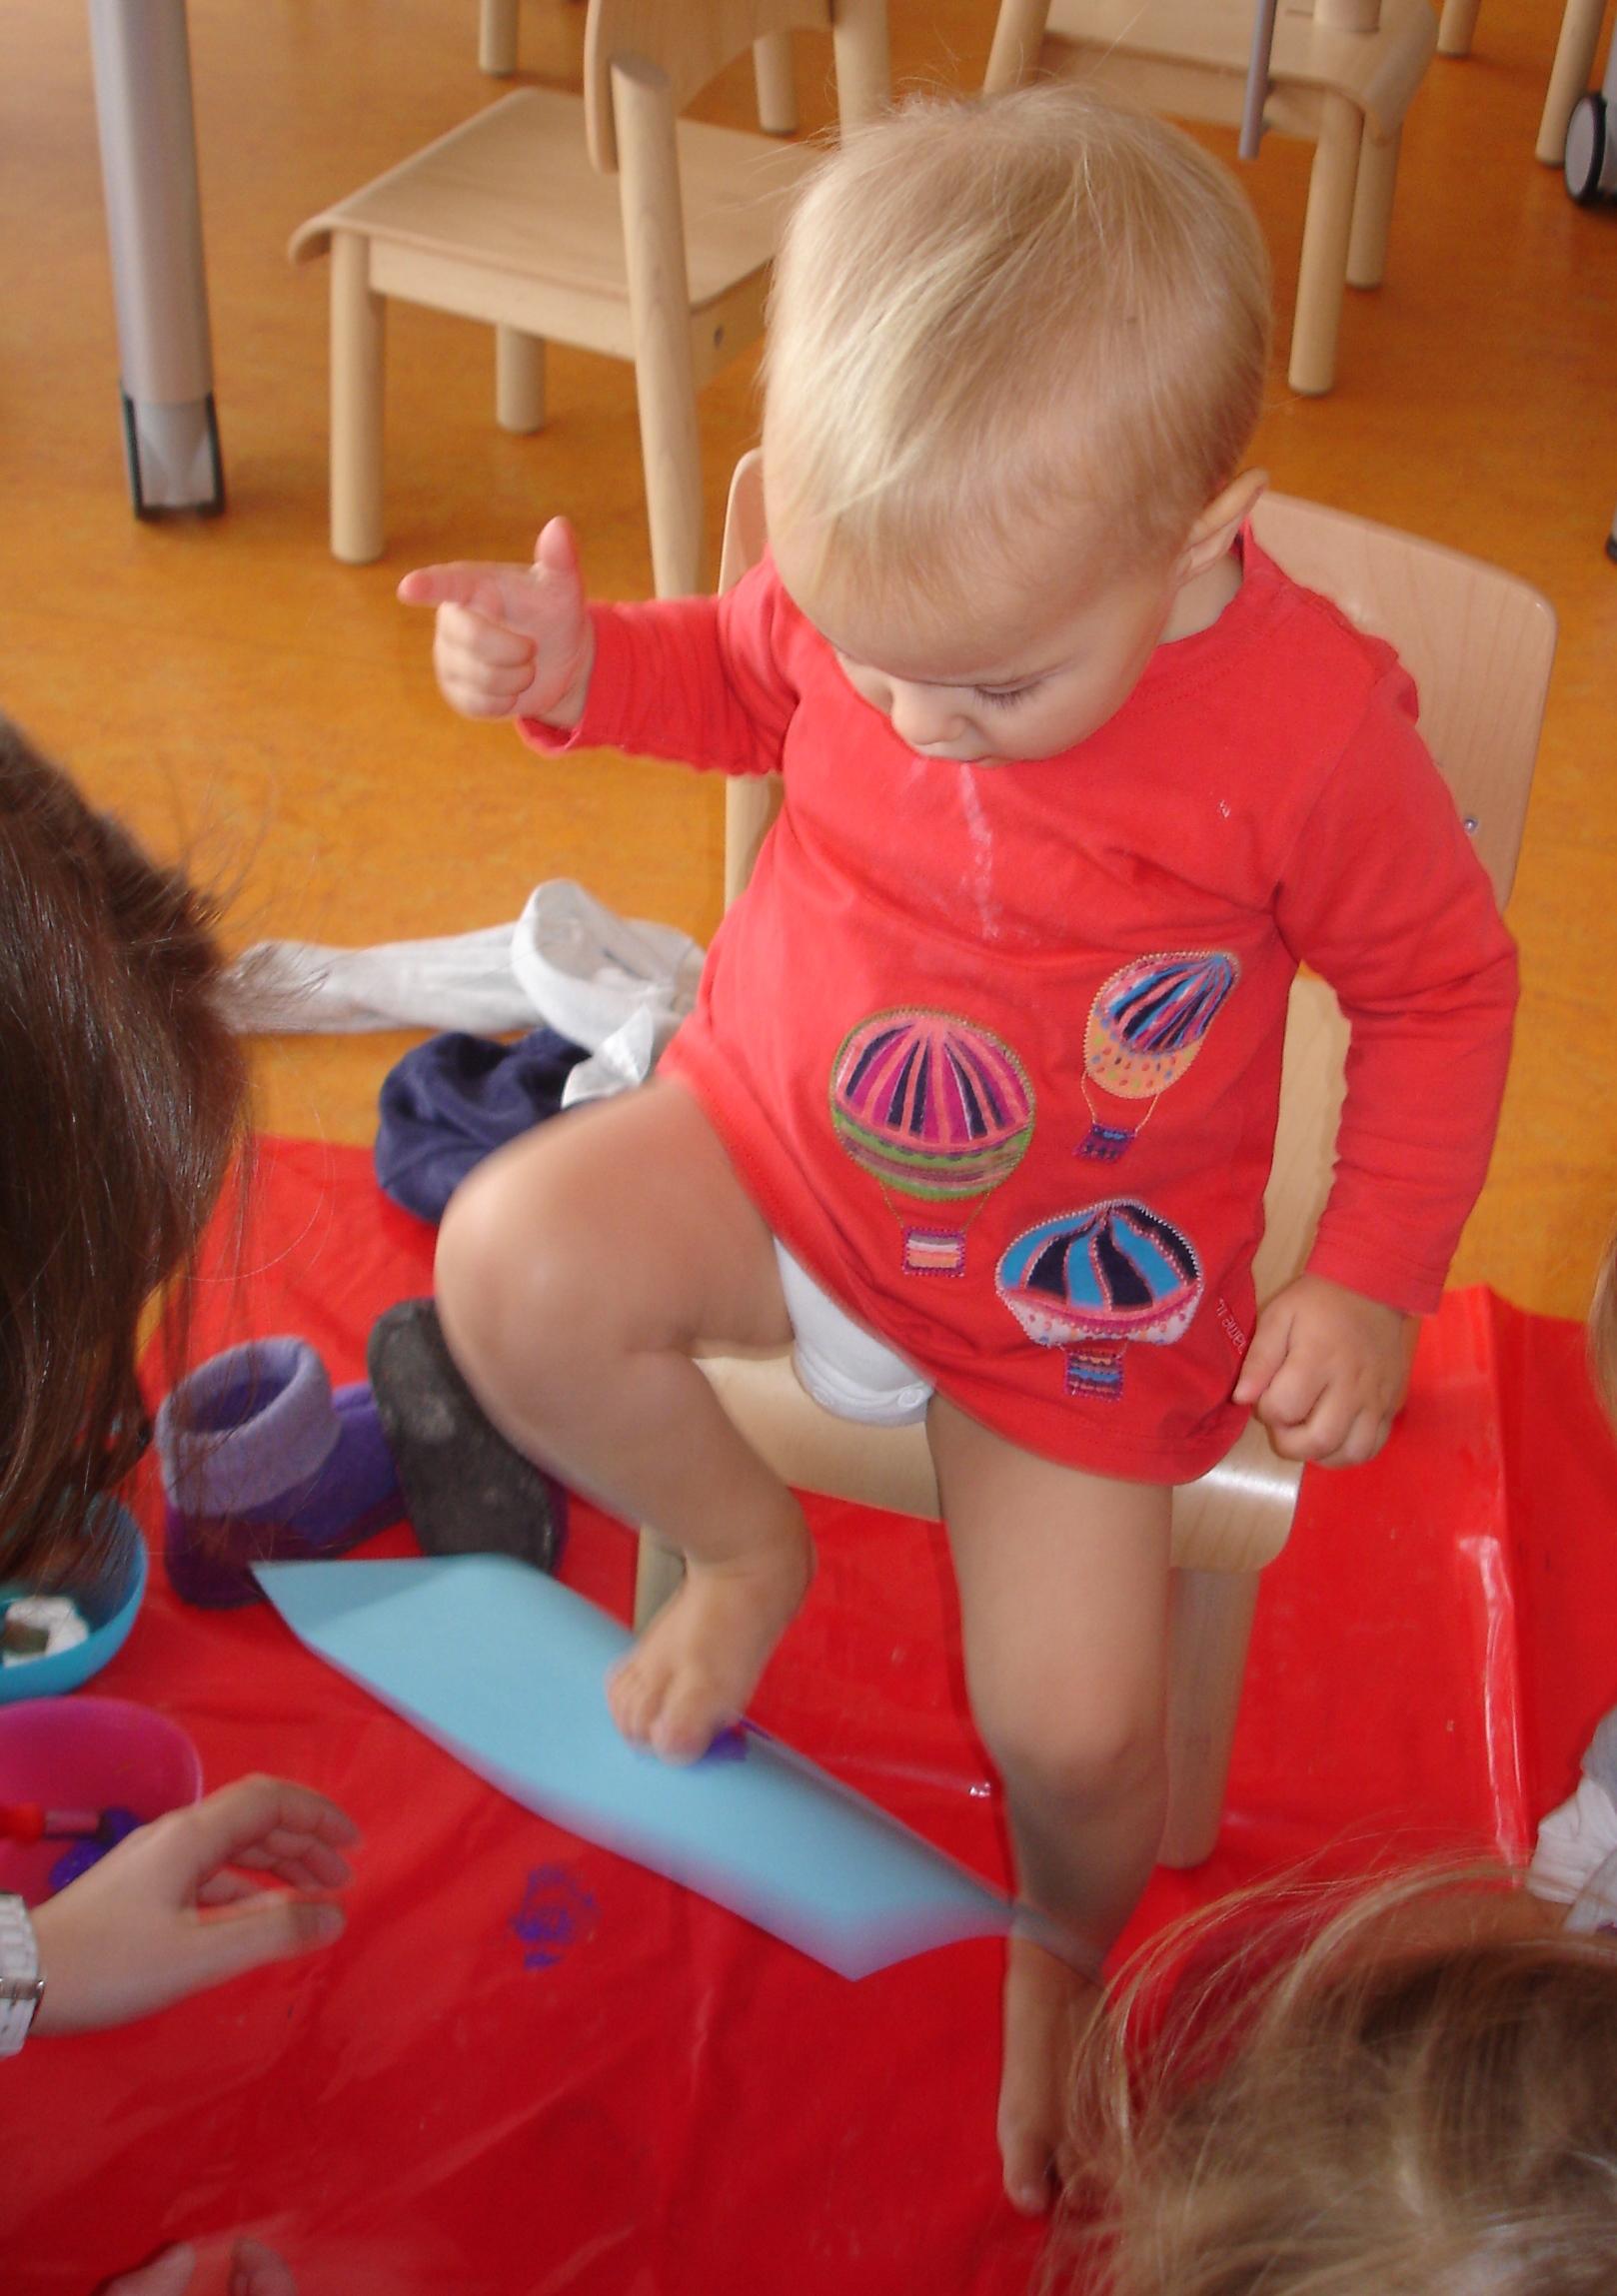 Blick durchs Schlüsselloch:  Der Krippenalltag unserer Tochter